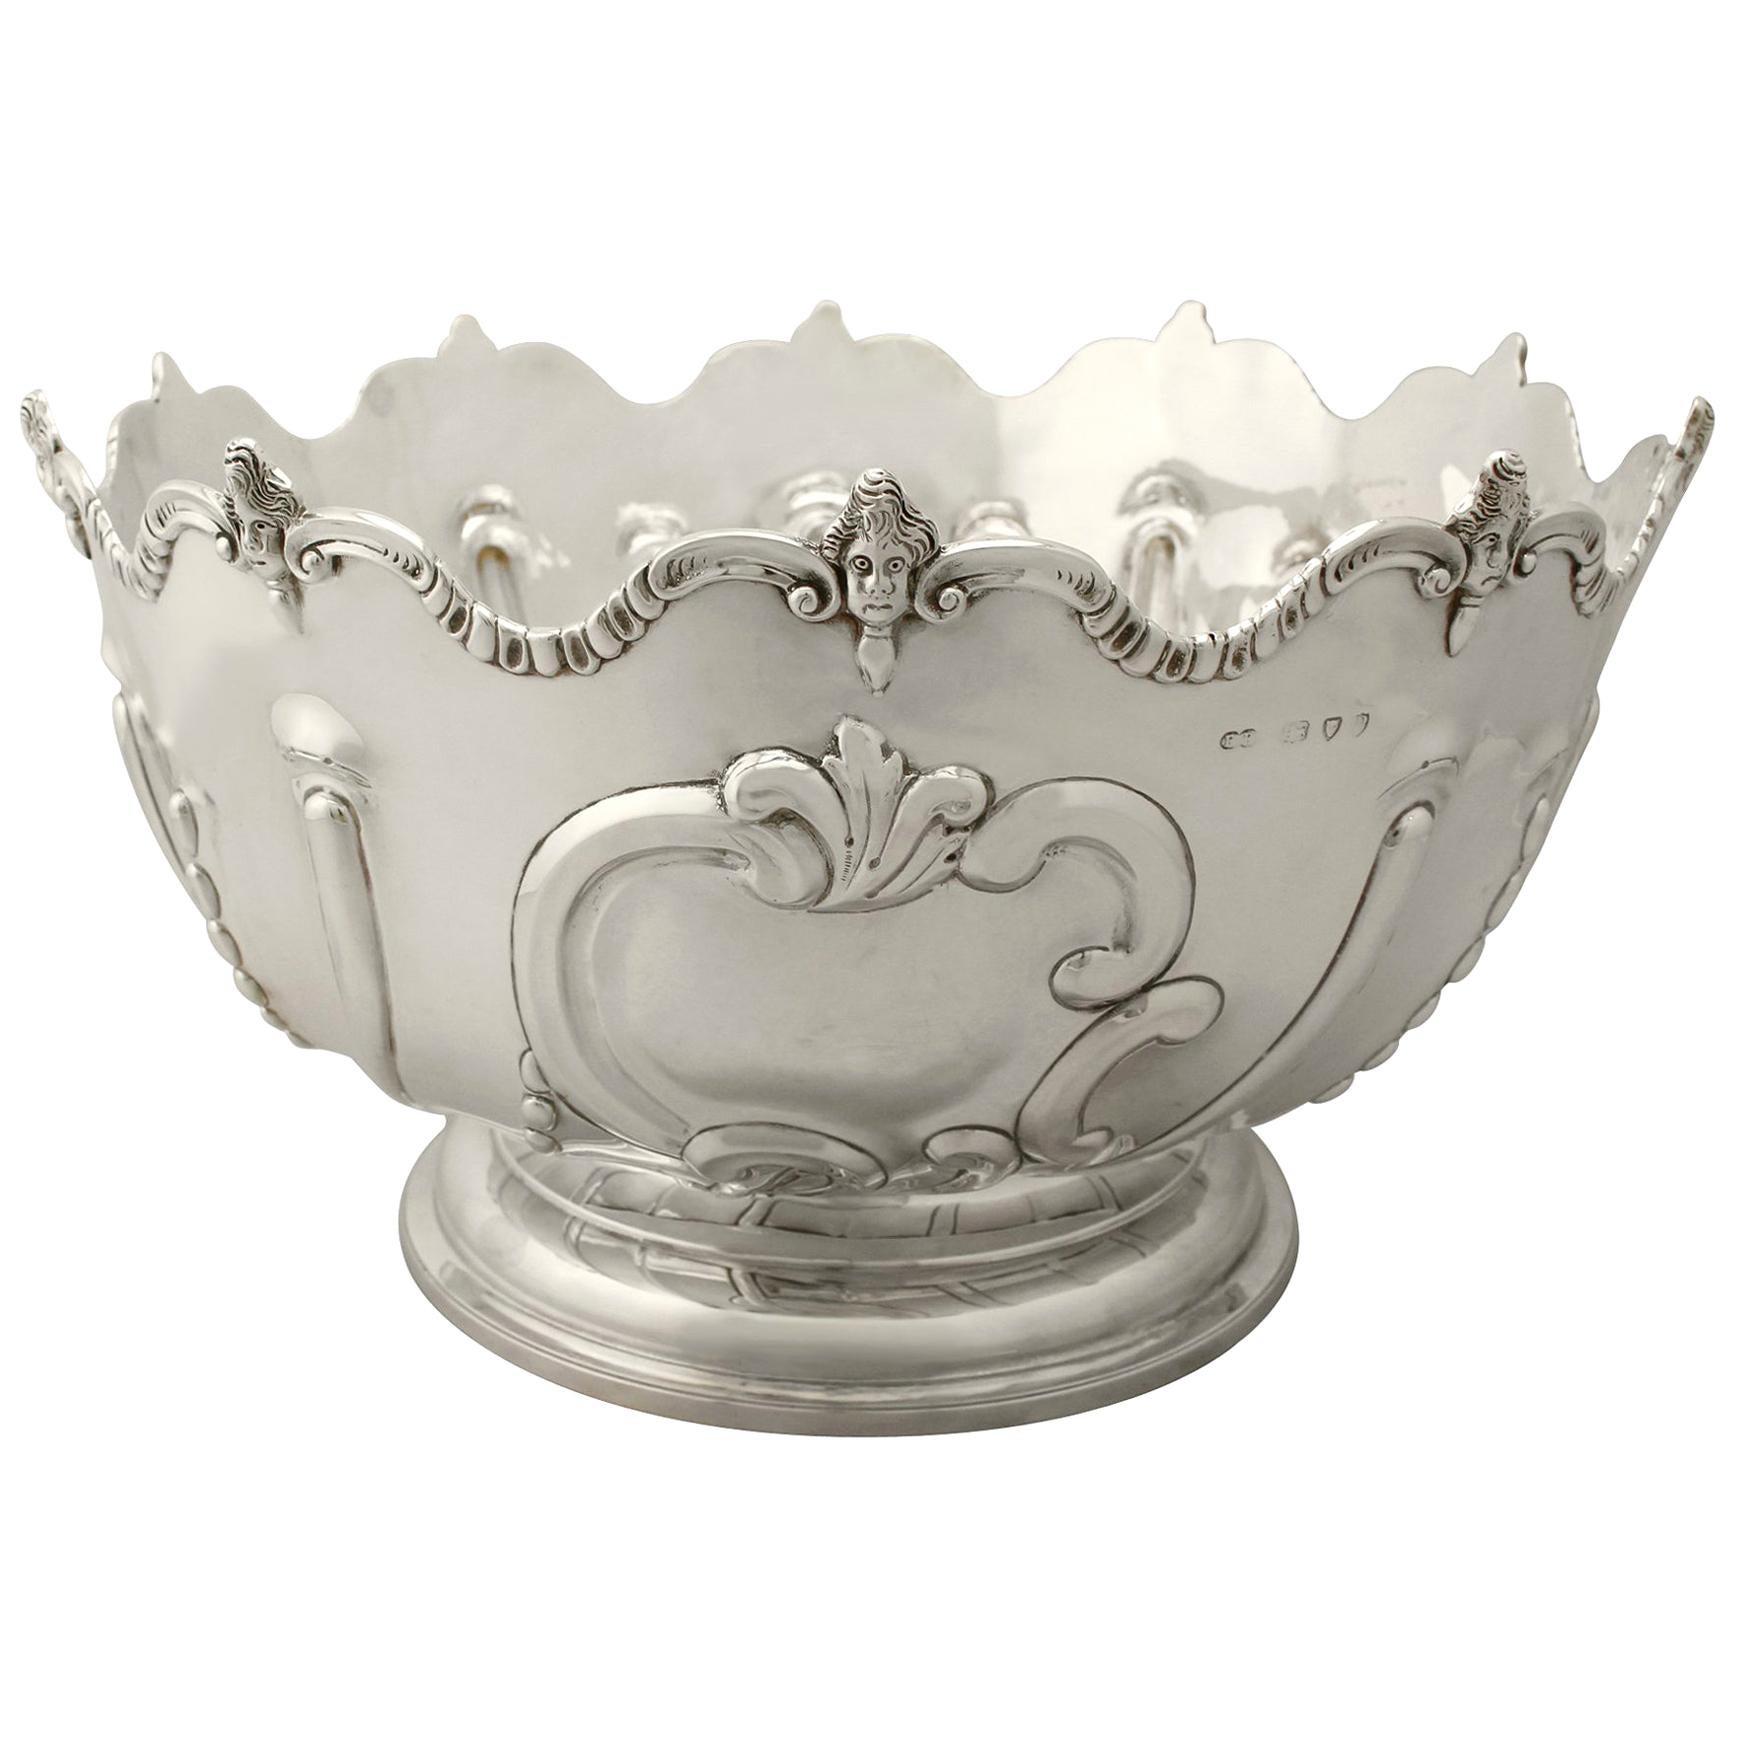 Antique Victorian Sterling Silver Presentation Bowl, 1890